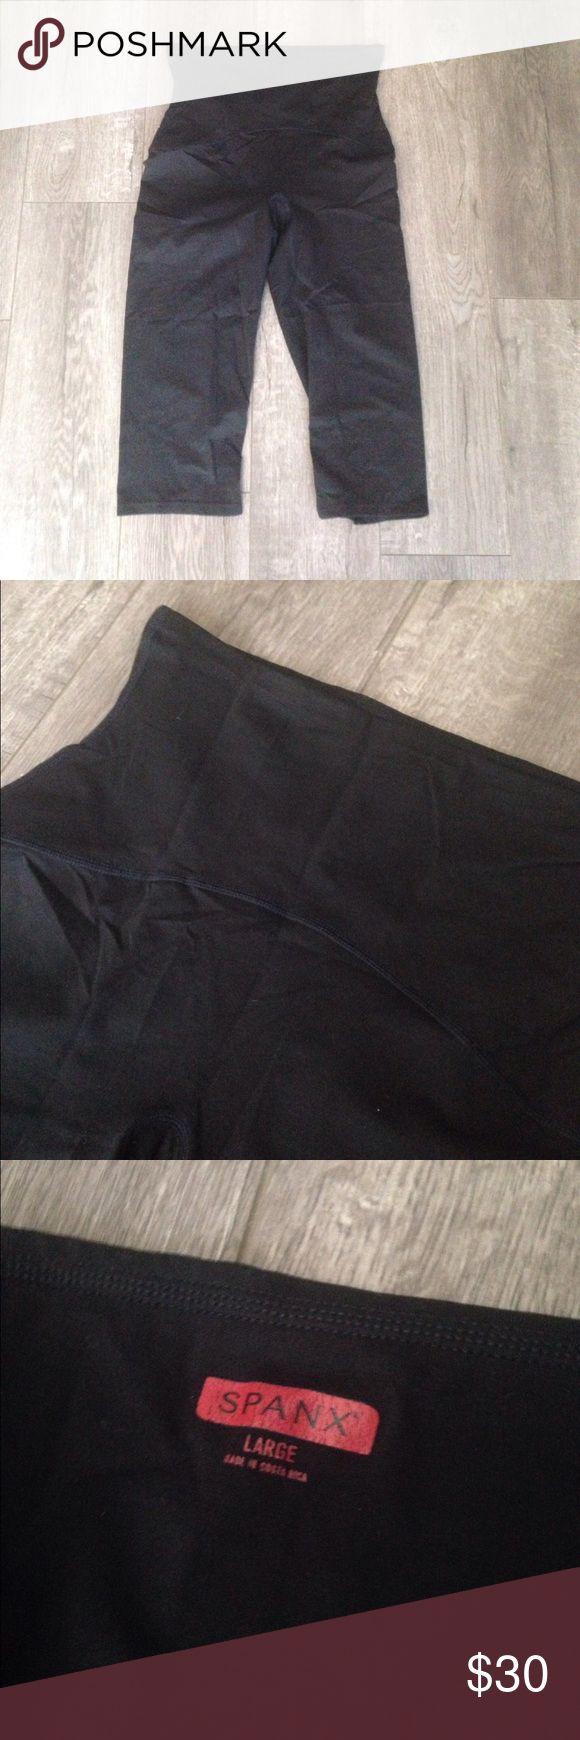 Black spanx size L Good used condition SPANX Intimates & Sleepwear Shapewear